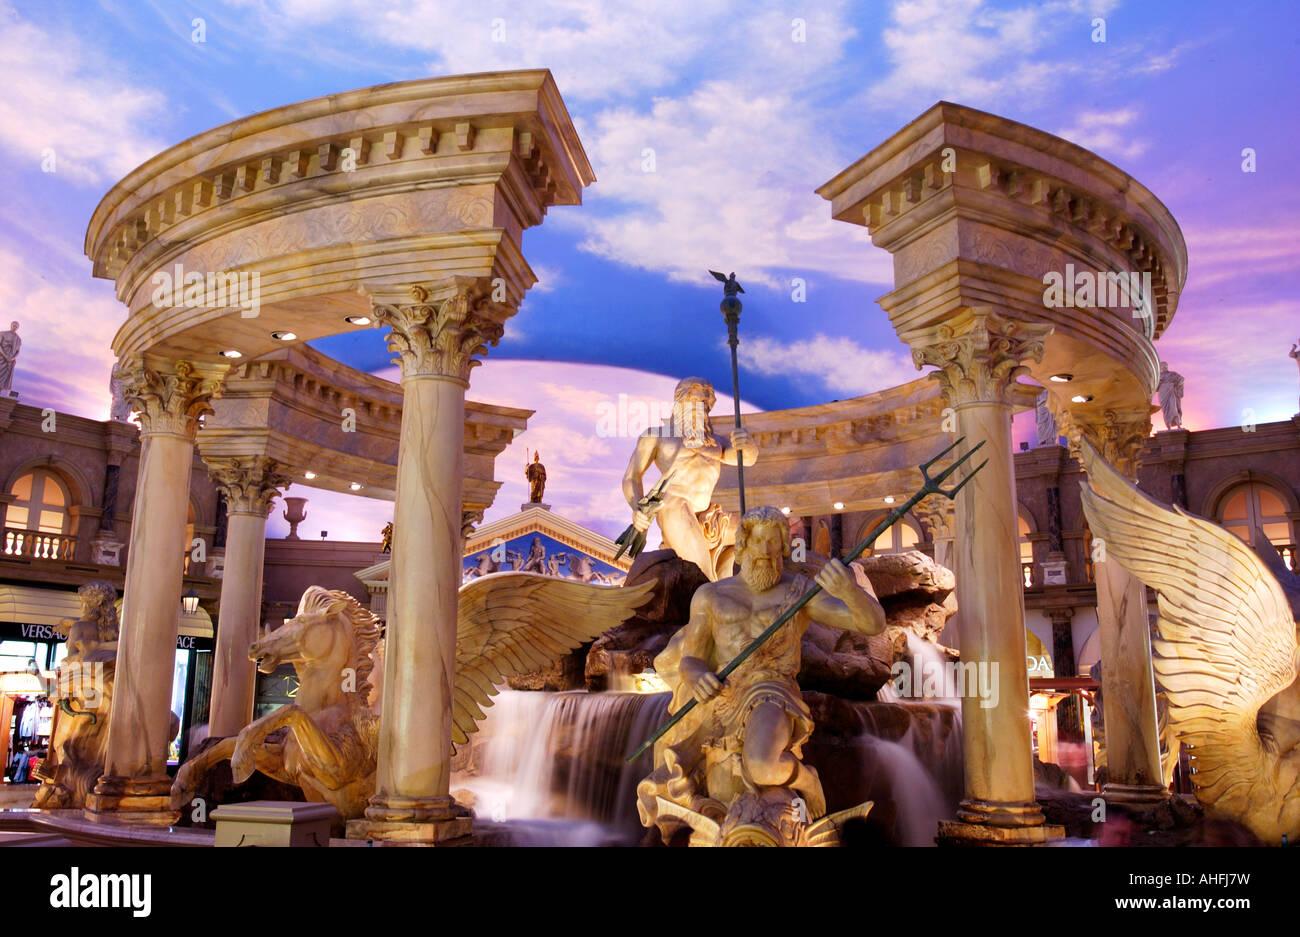 Statues in Forum Shops at Caesars Palace Las Vegas - Stock Image